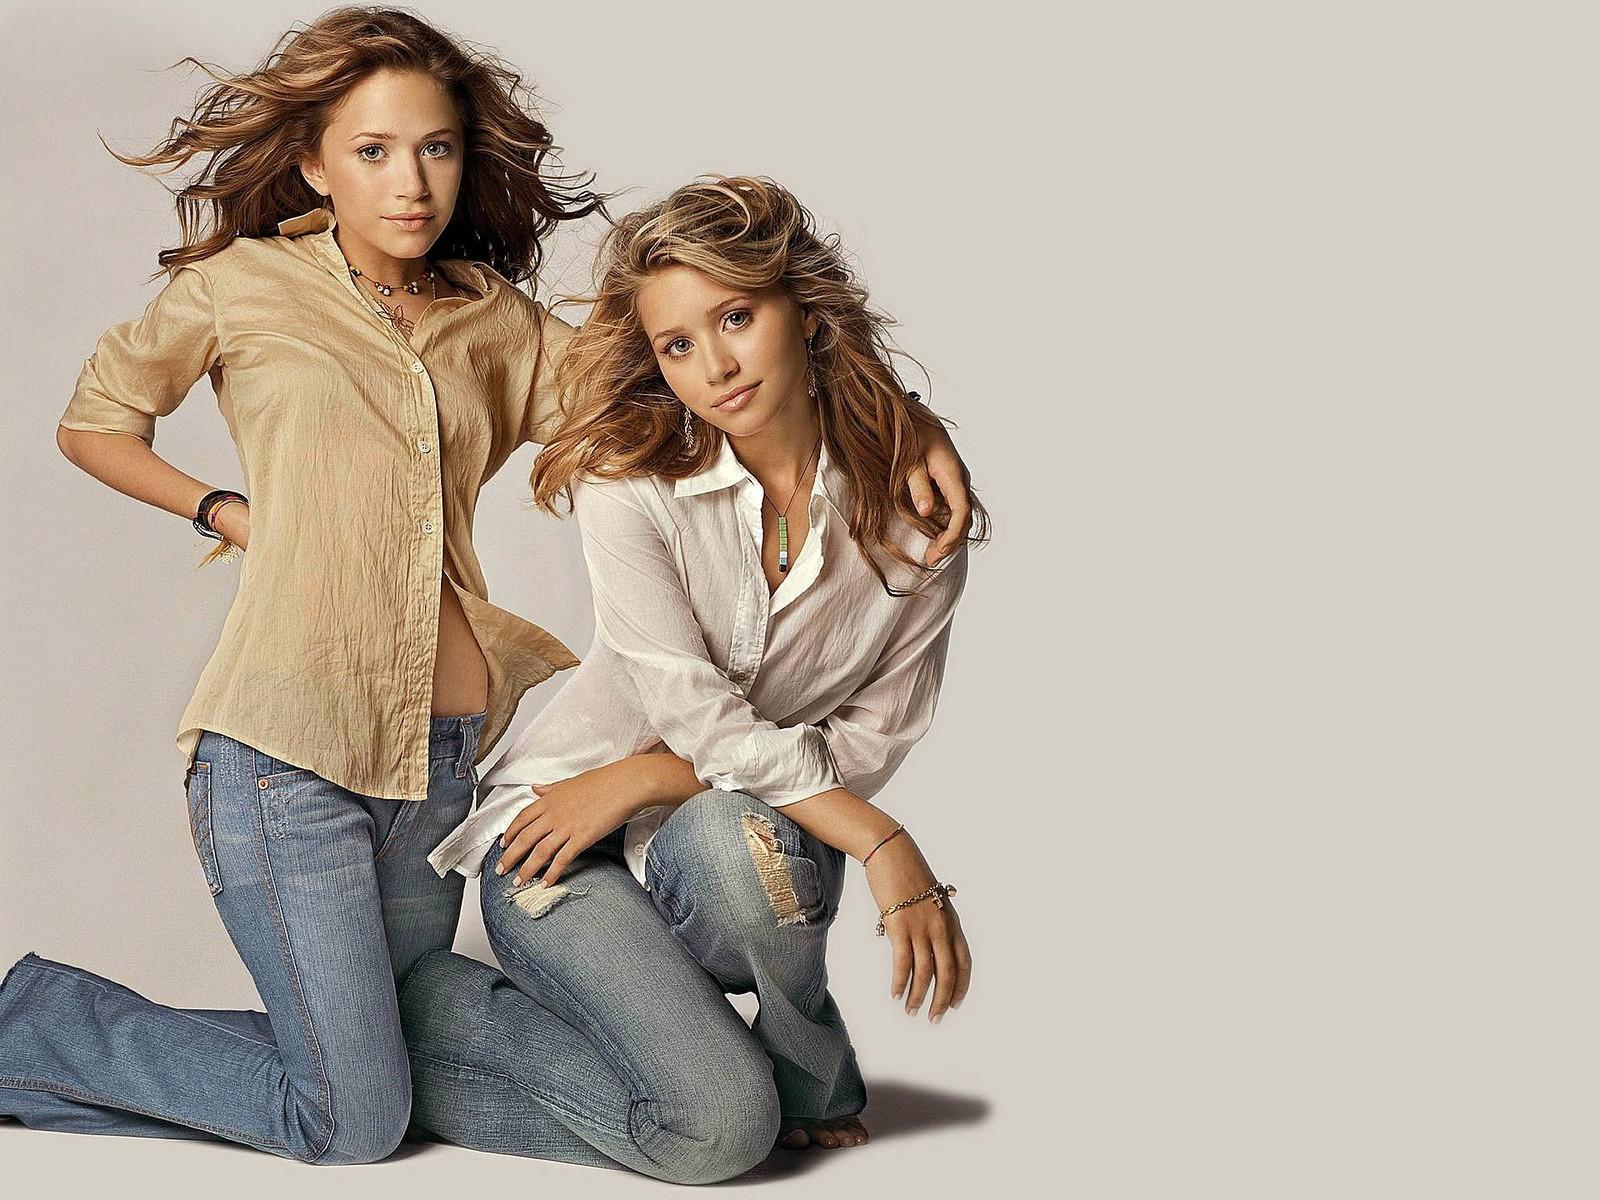 Olsen Twins 1600x1200 Wallpaper Resolution1600x1200 294views Image 1600x1200